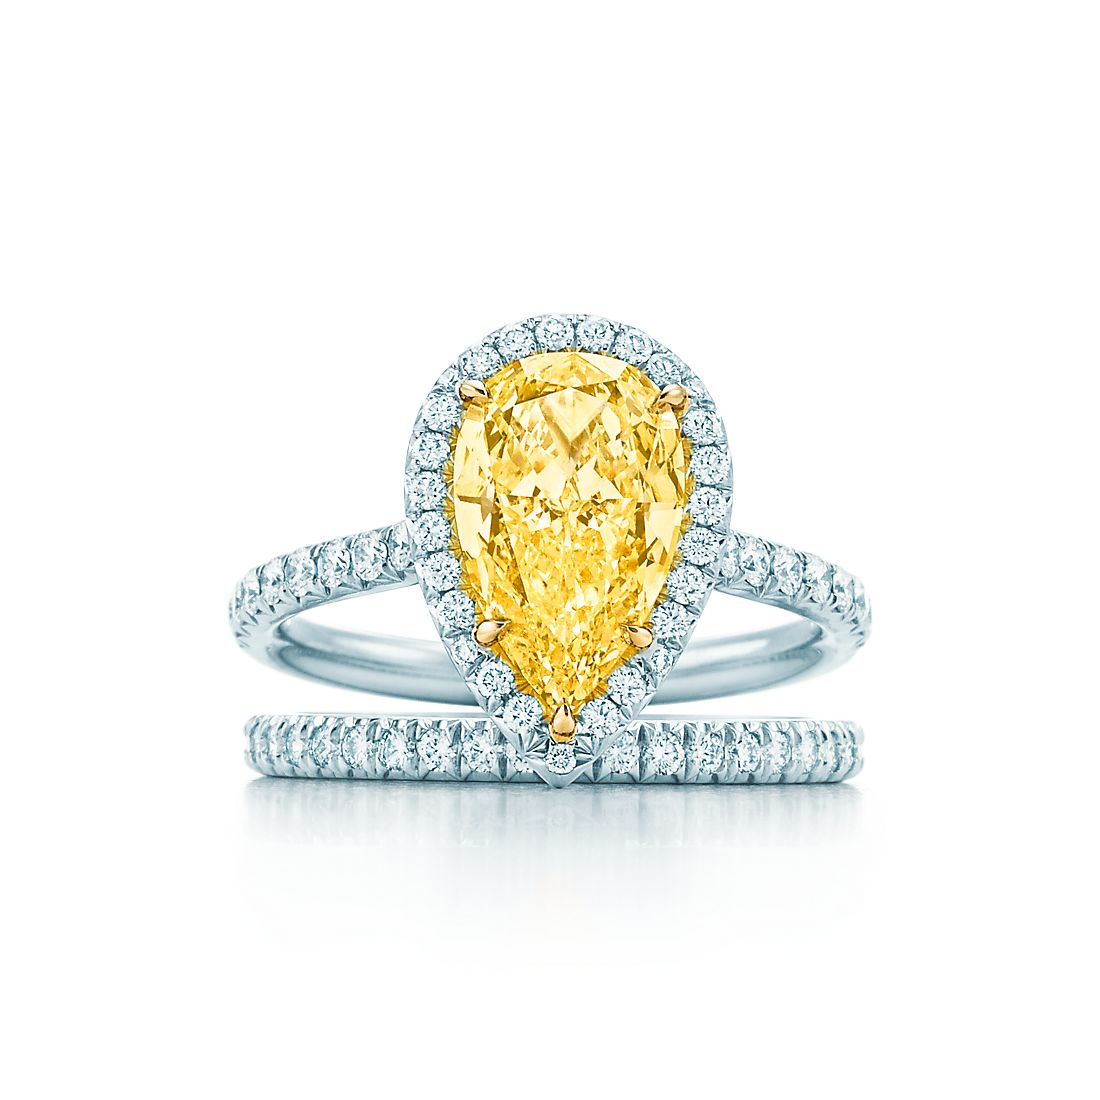 Look - Diamond yellow engagement rings video